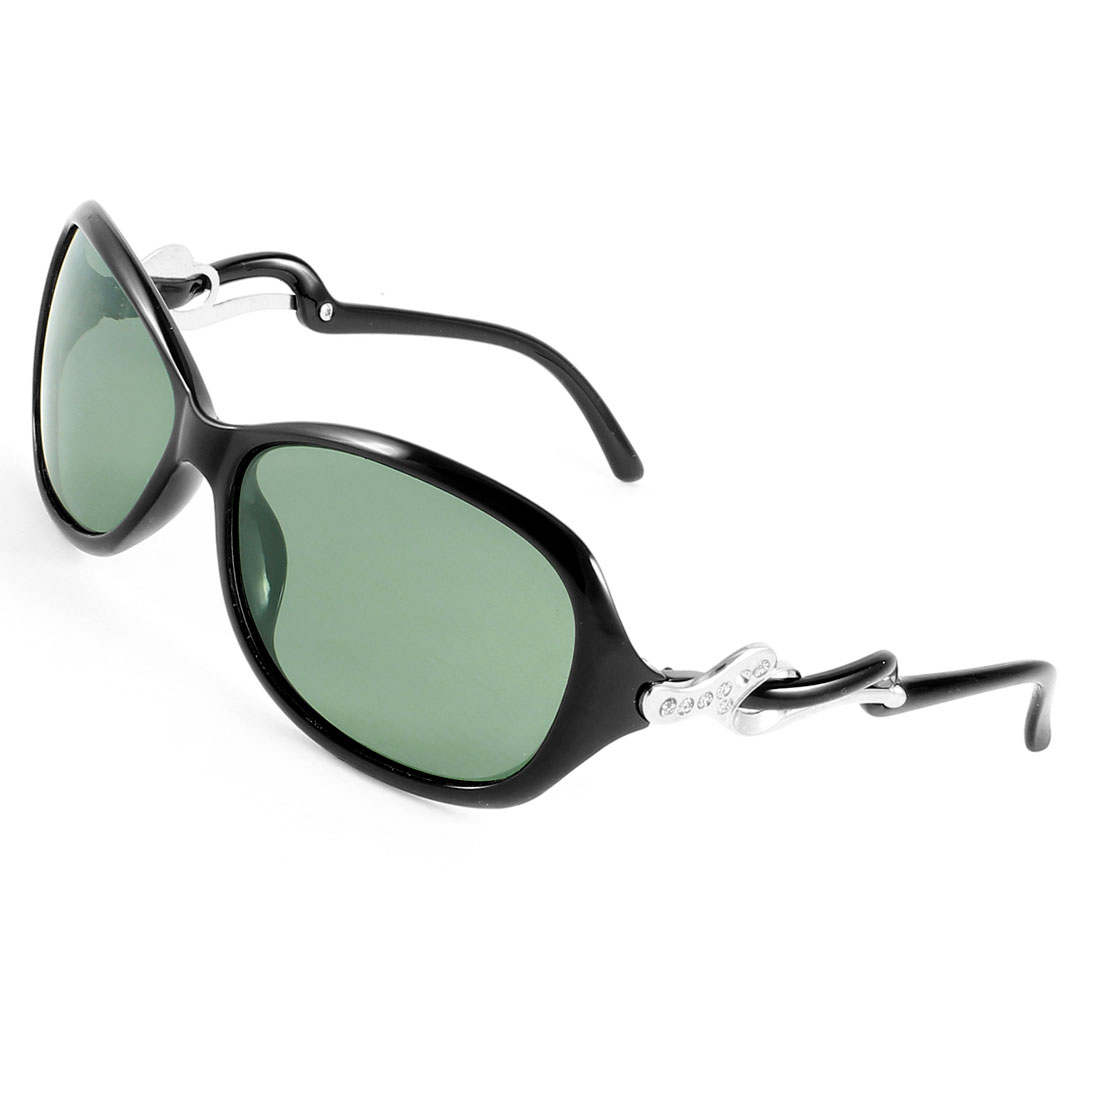 Ladies Women Glitter Powder Decor Full Rim Eyeglasses Polarized Sunglasses Black